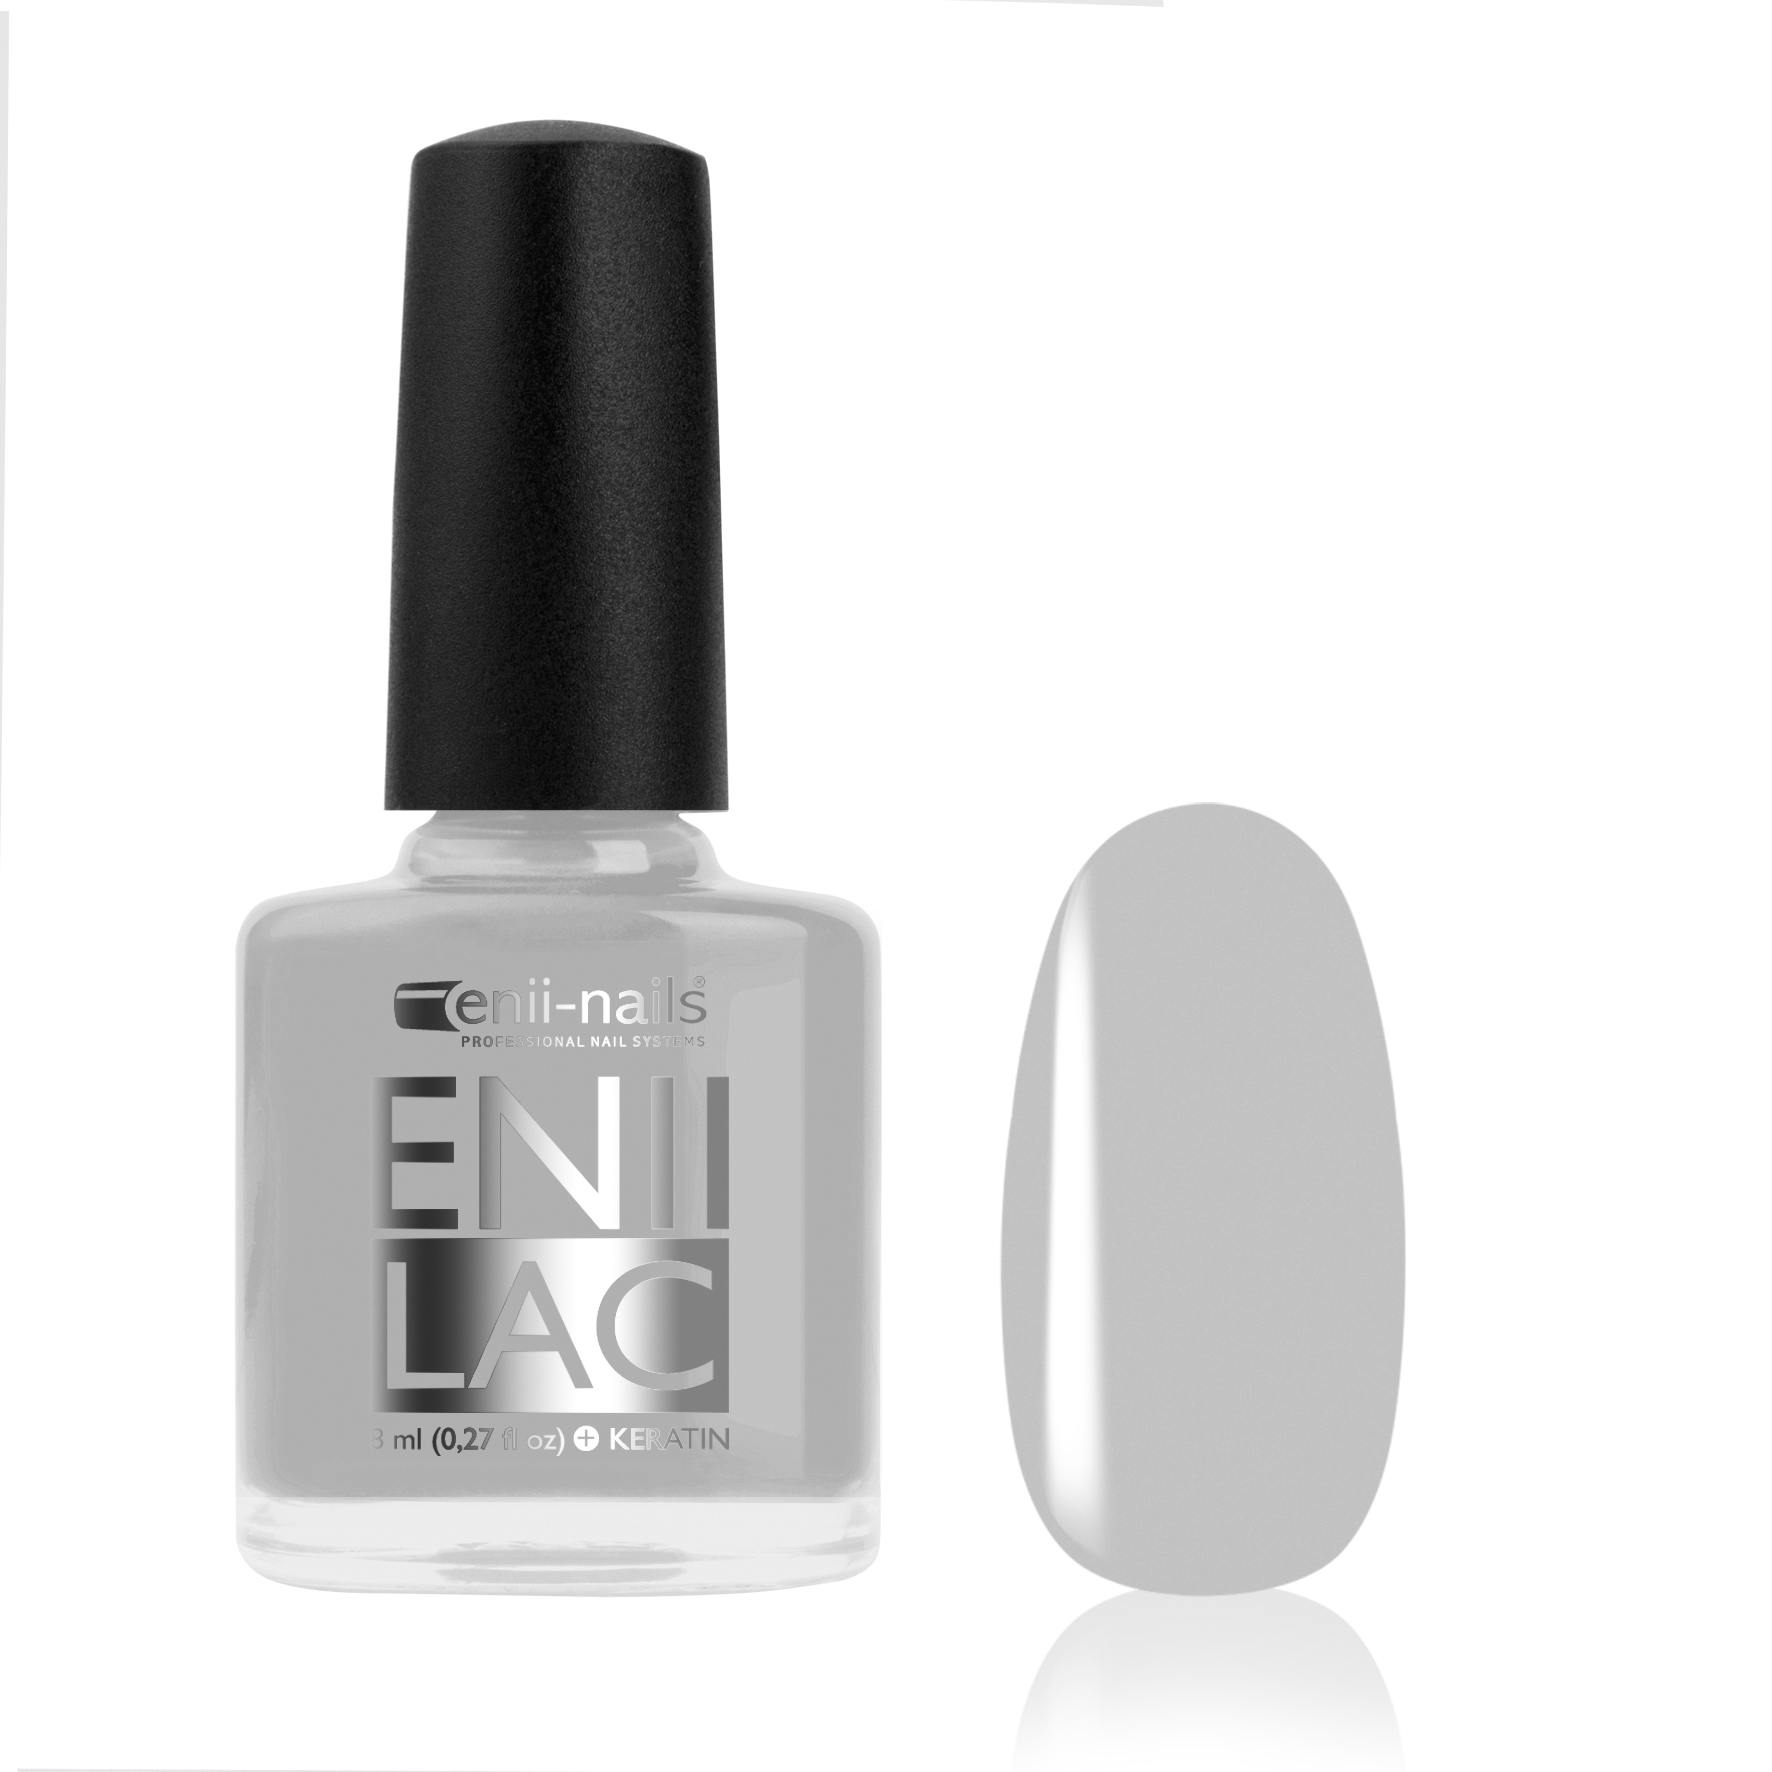 ENII-NAILS ENII LAC 8 ml - Silver Dust